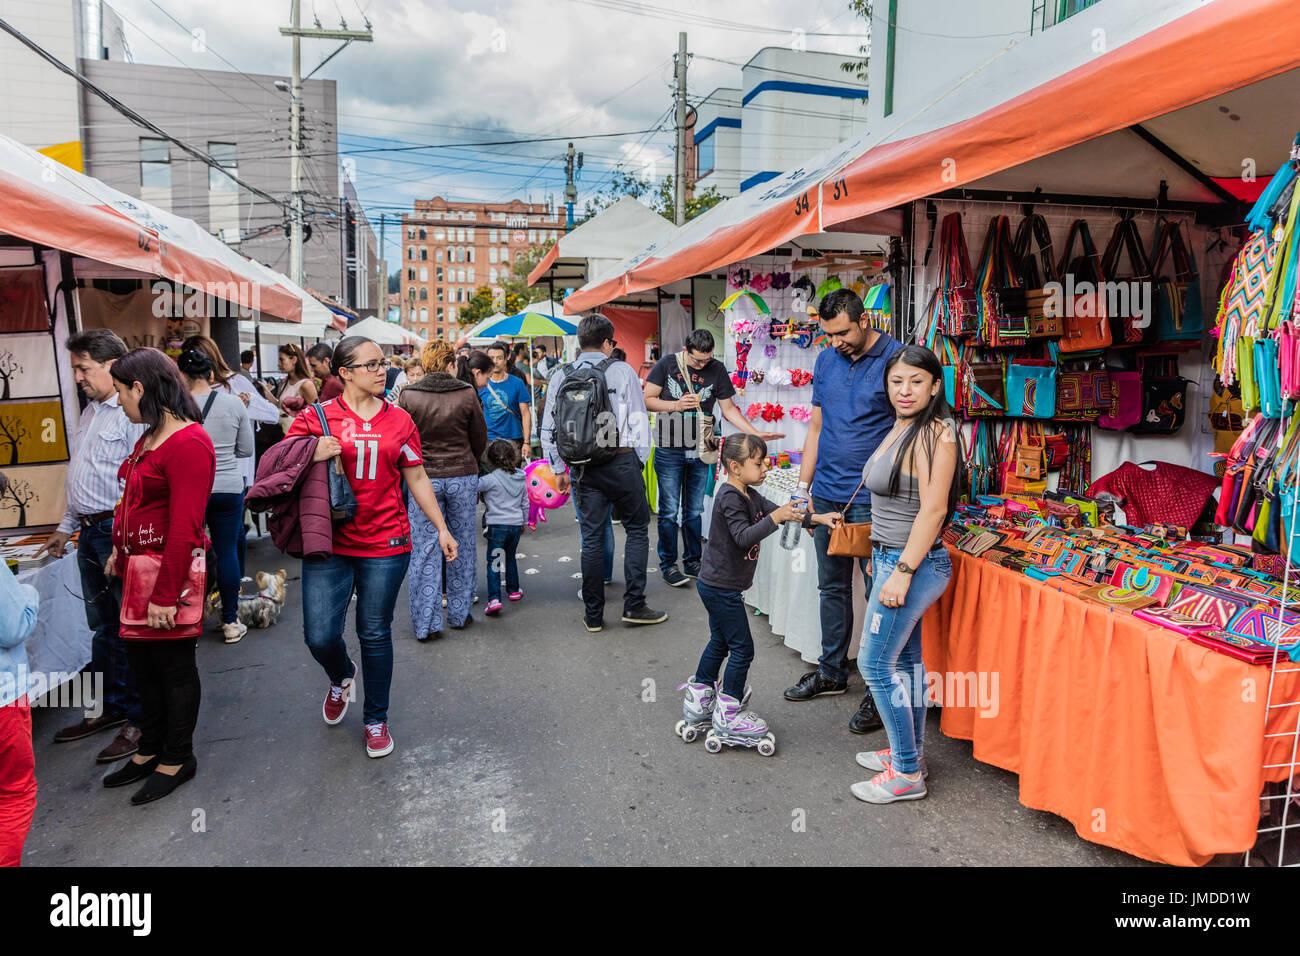 Bogota, Colombia  - February 6, 2017 : People shopping at Mercado de las Pulgas de Usaquen free market  in Bogota capital city of Colombia South America - Stock Image